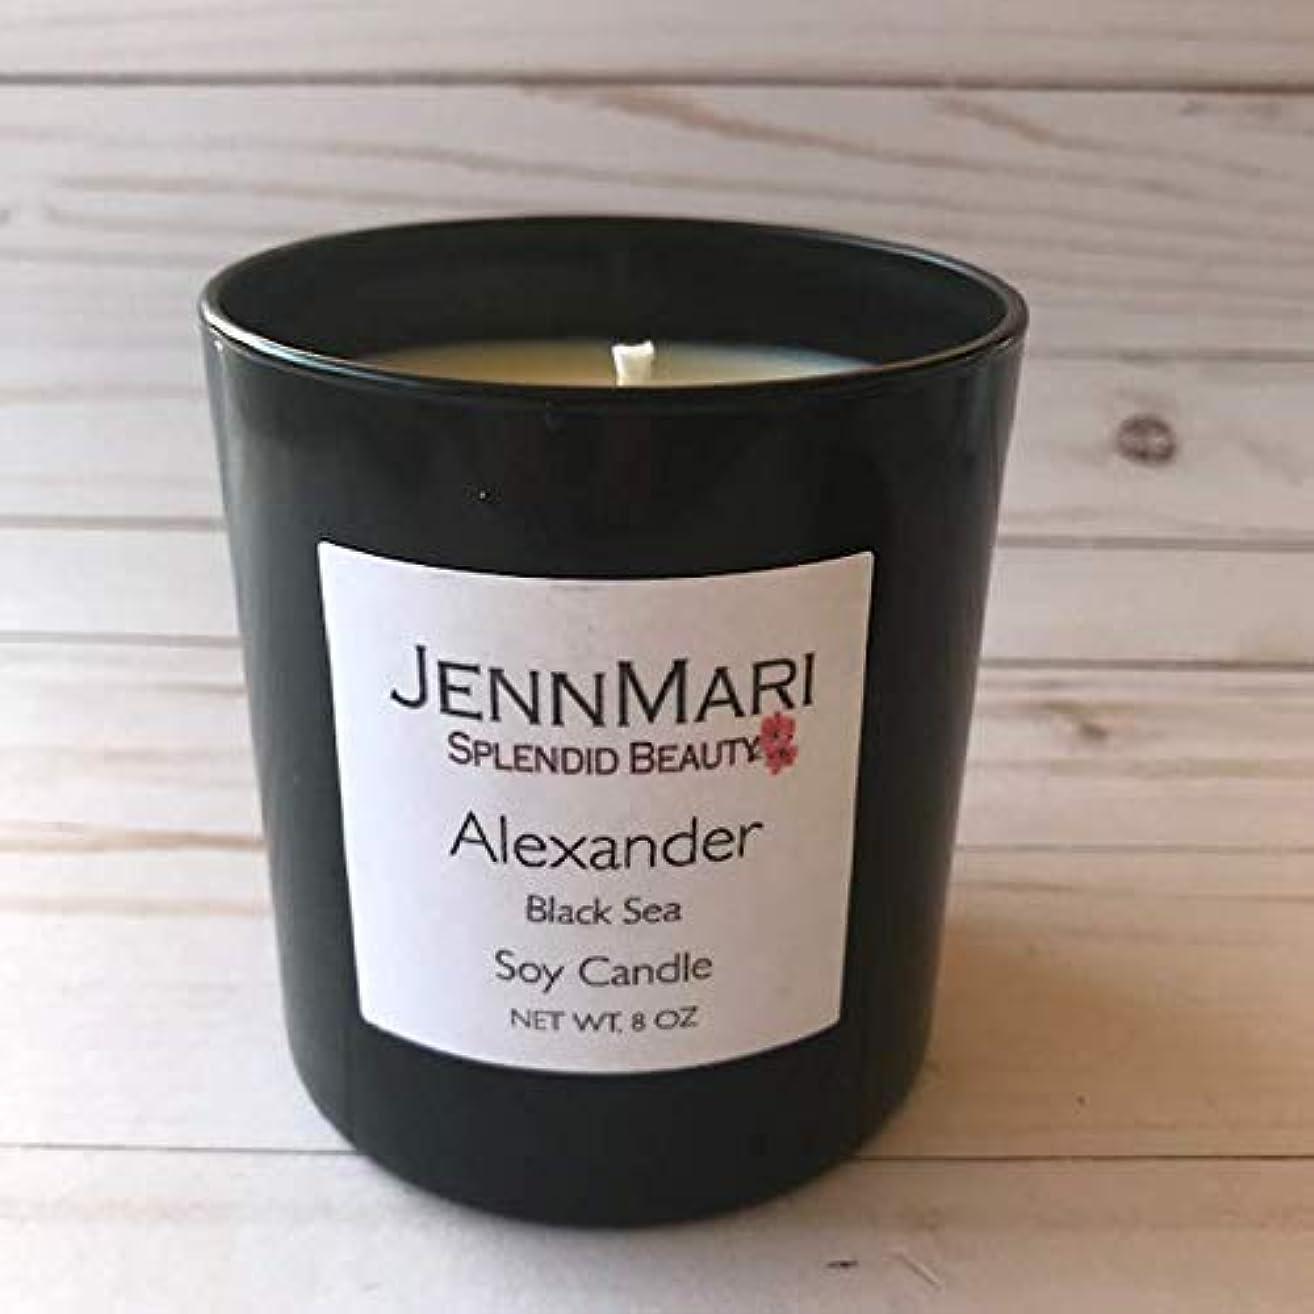 Splendid Beauty   Black Sea Scented Soy Candle Glass Jar   10 Oz   Handmade   Eco-friendly   Vegan   Cotton Wick   100% Soy Wax